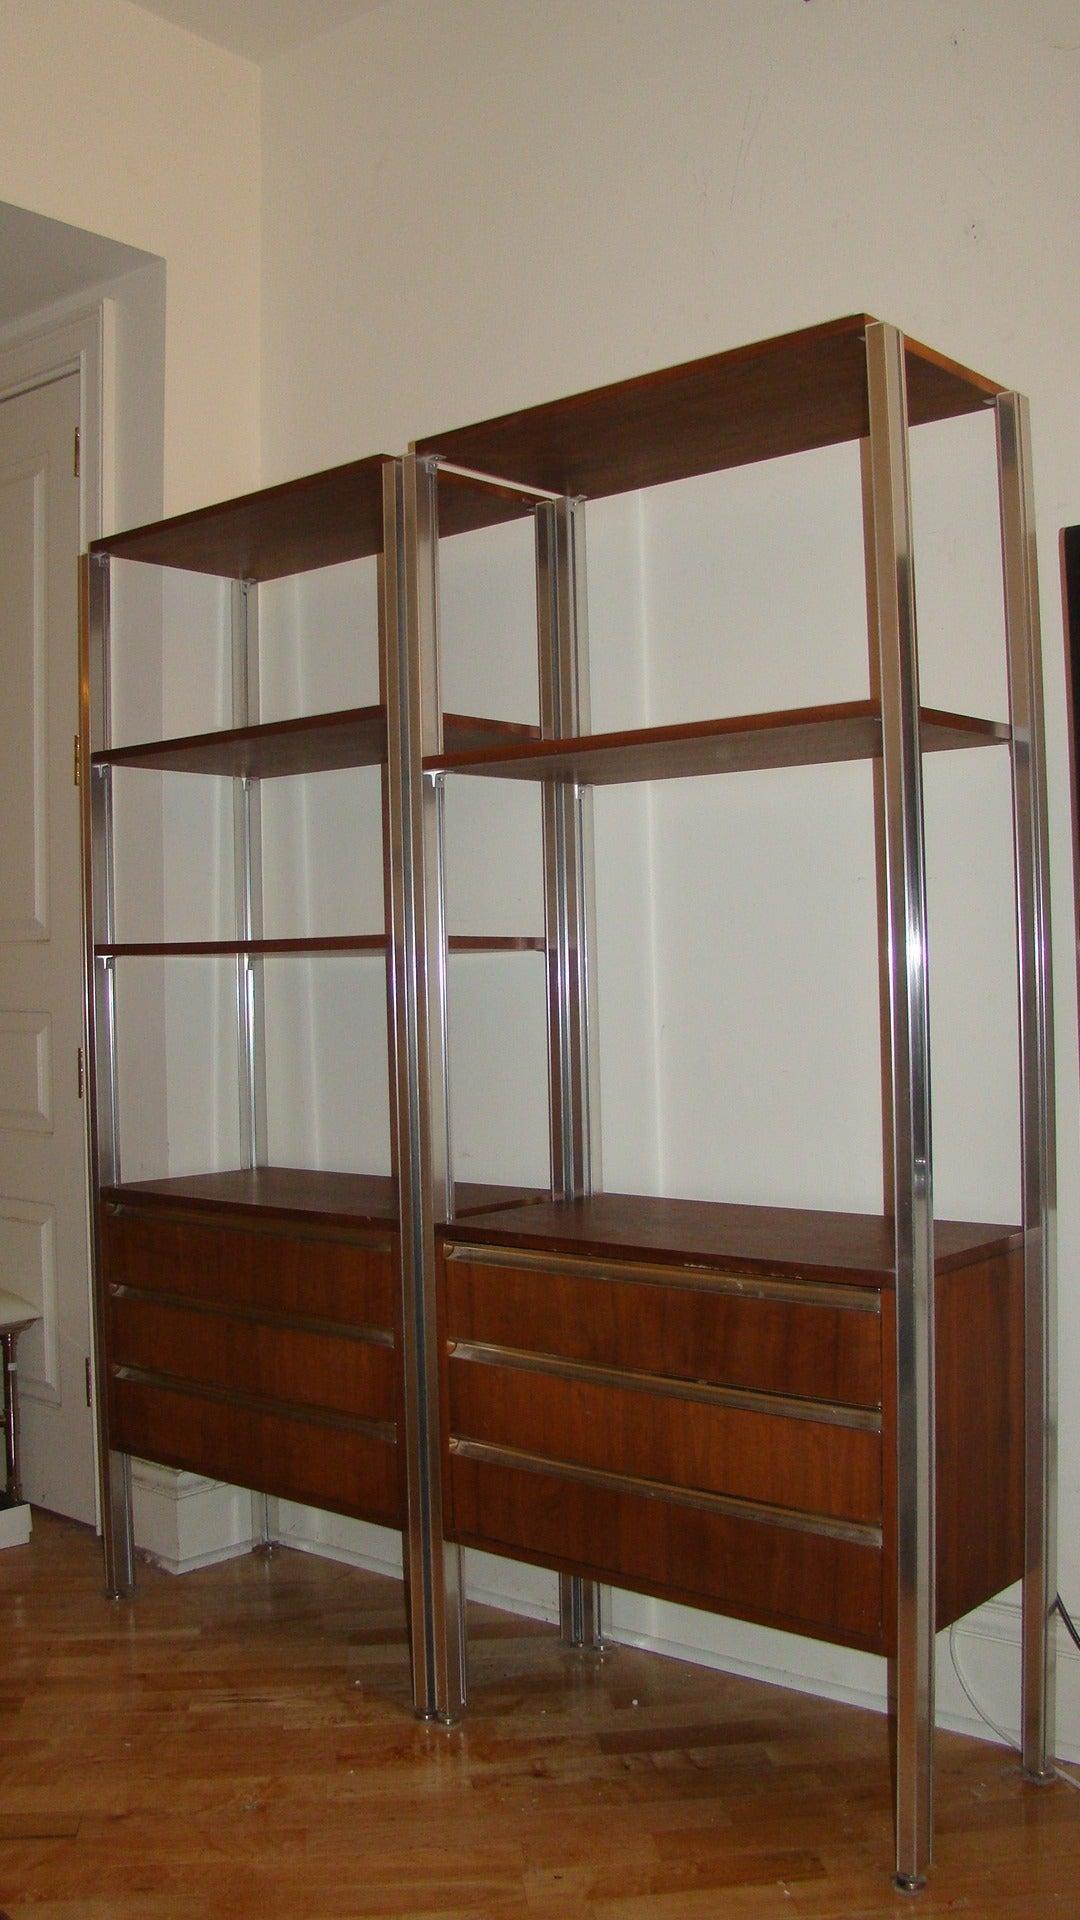 Pair of italian modern mid century bookcase storage wall - Modern bookshelf wall unit ...